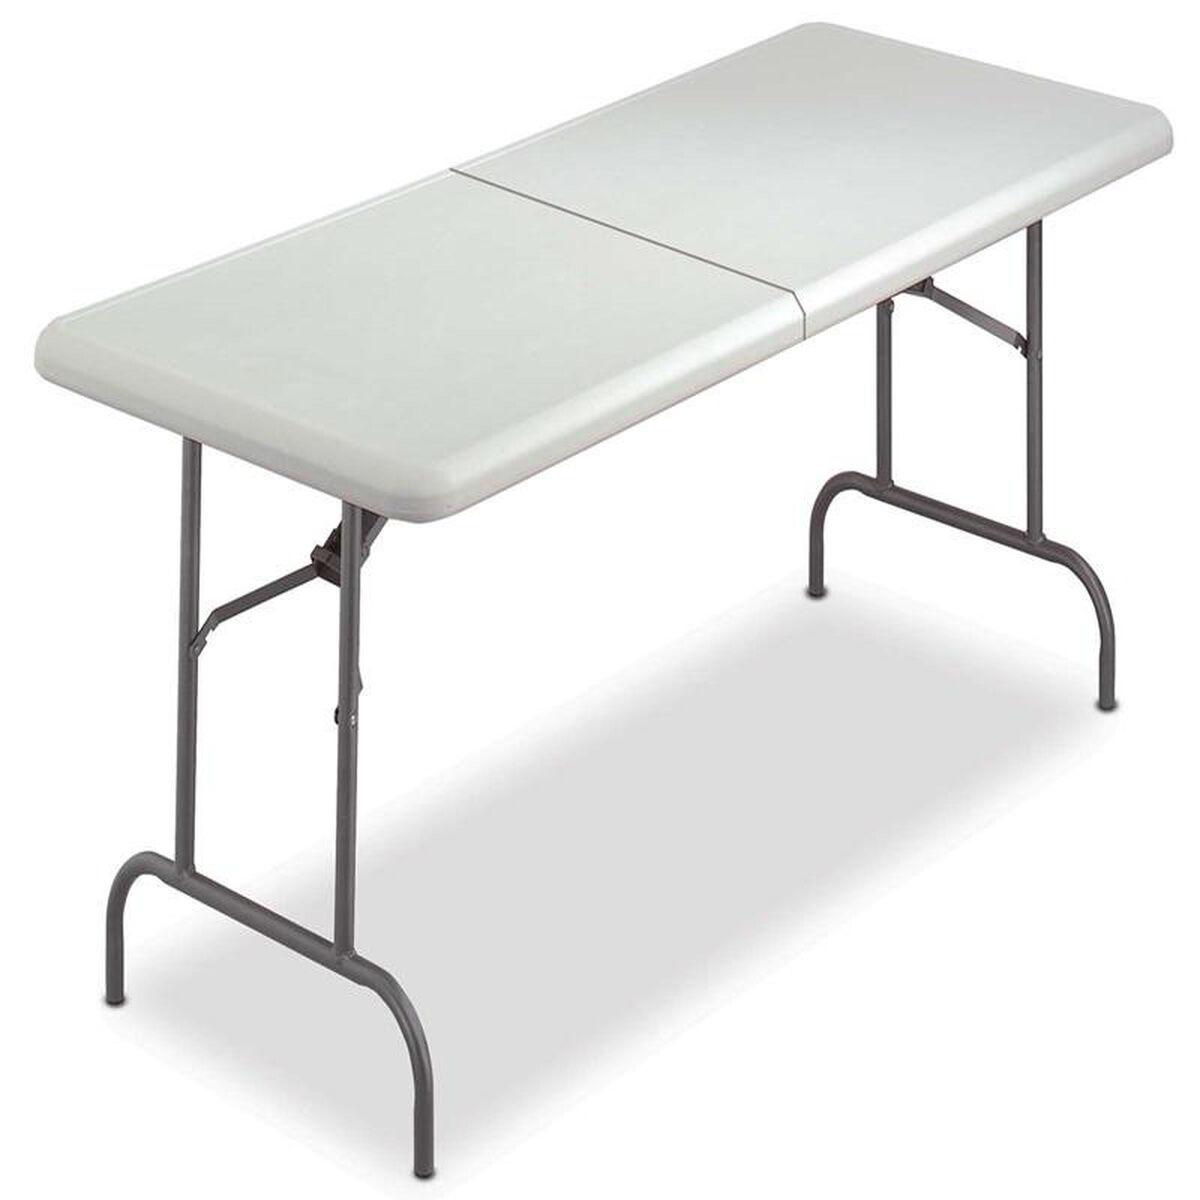 resin bi fold table platinum ice65453 bestchiavarichairs com